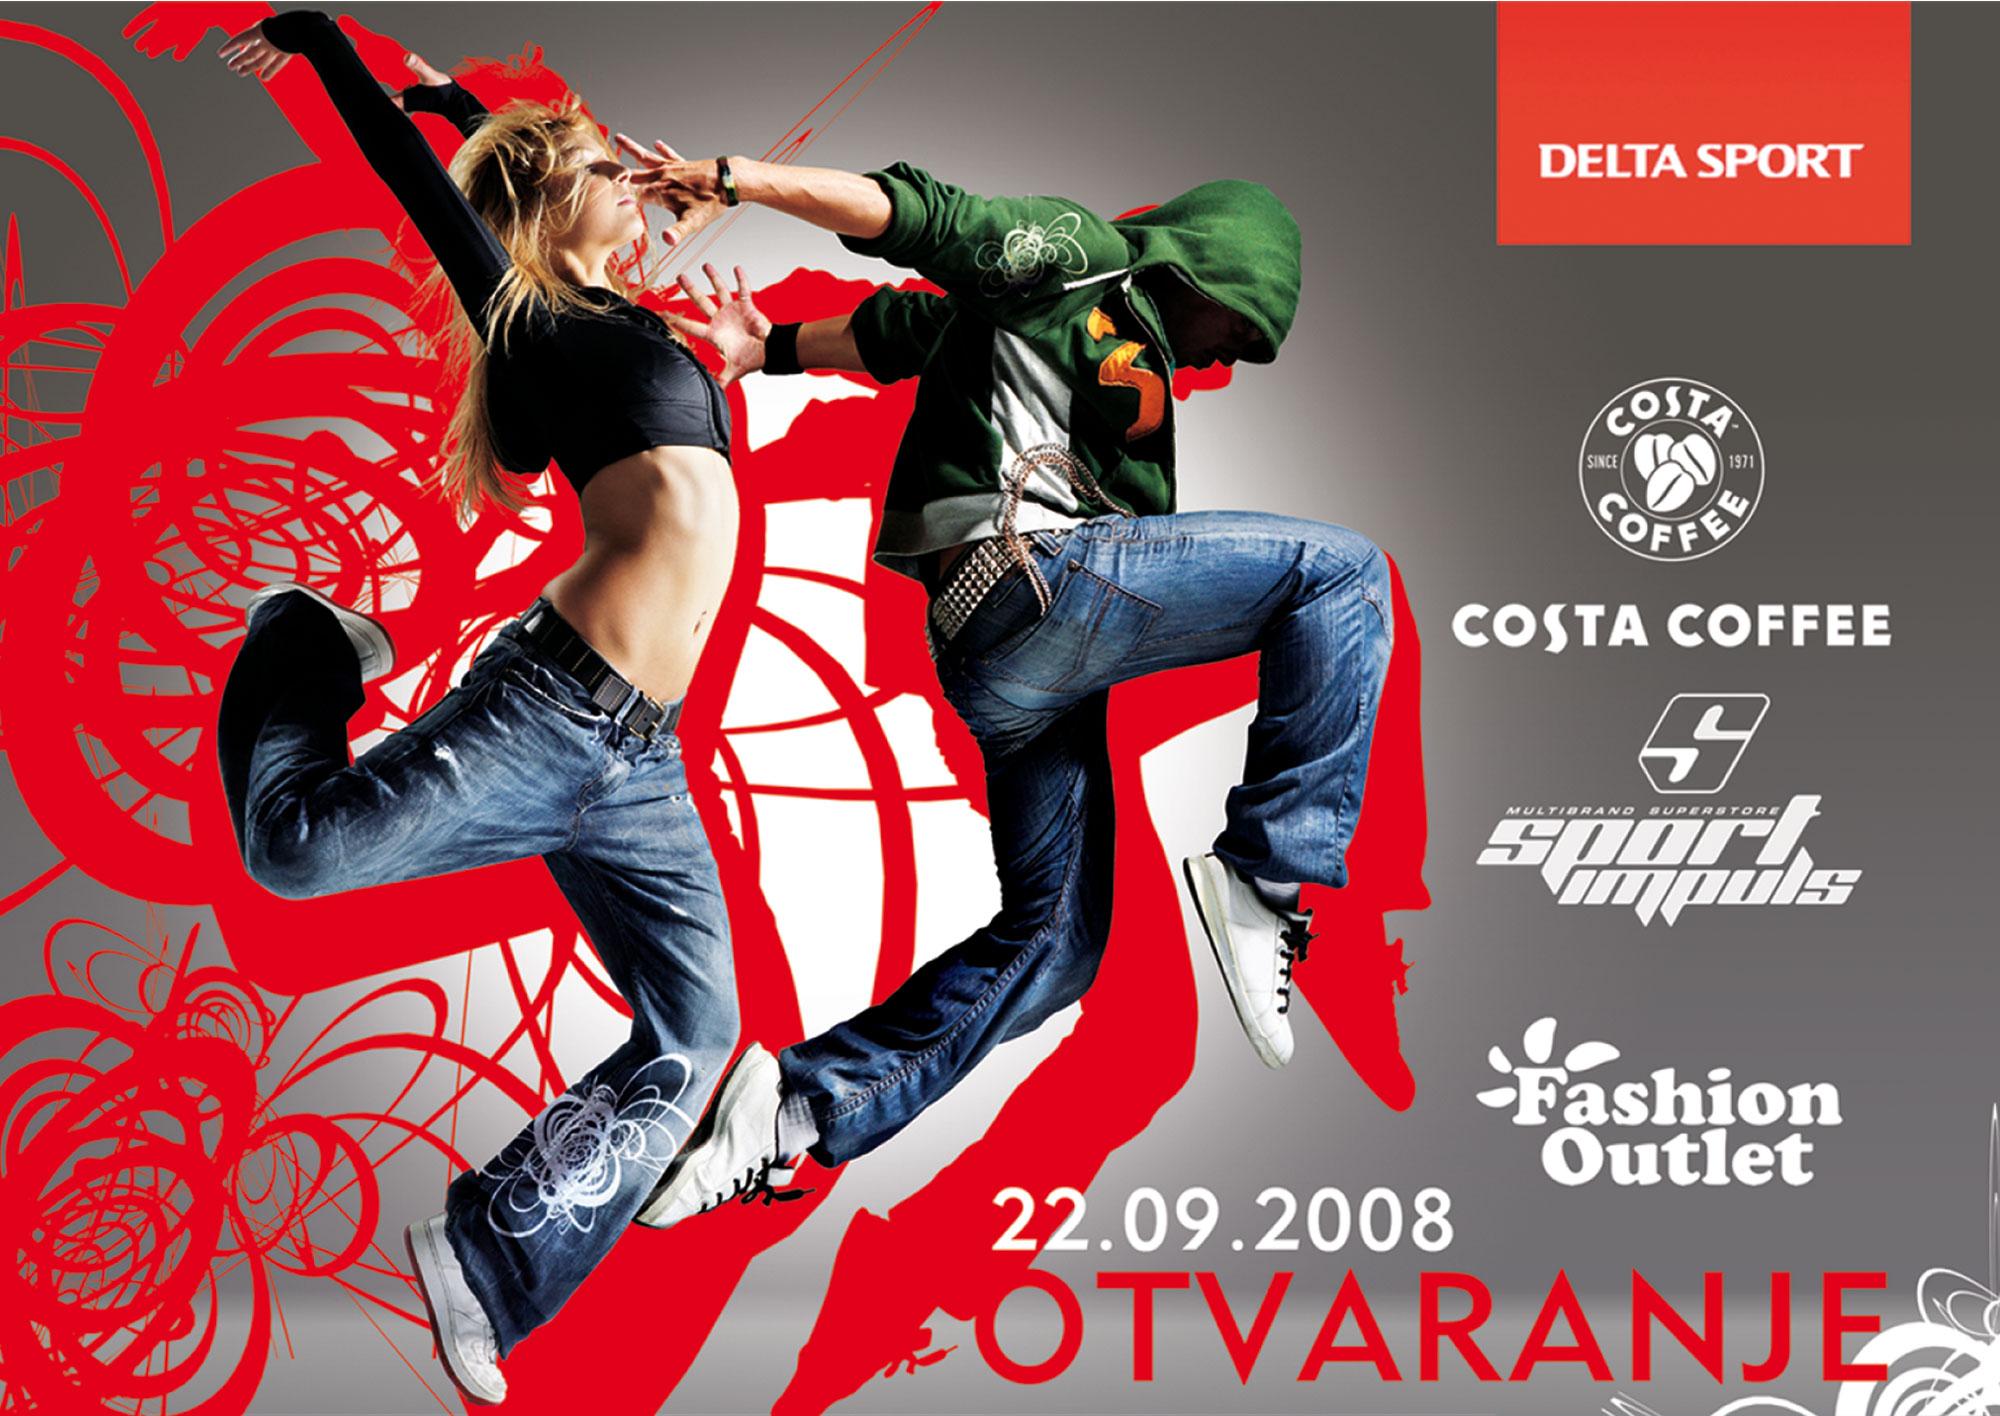 delta sport poster 1